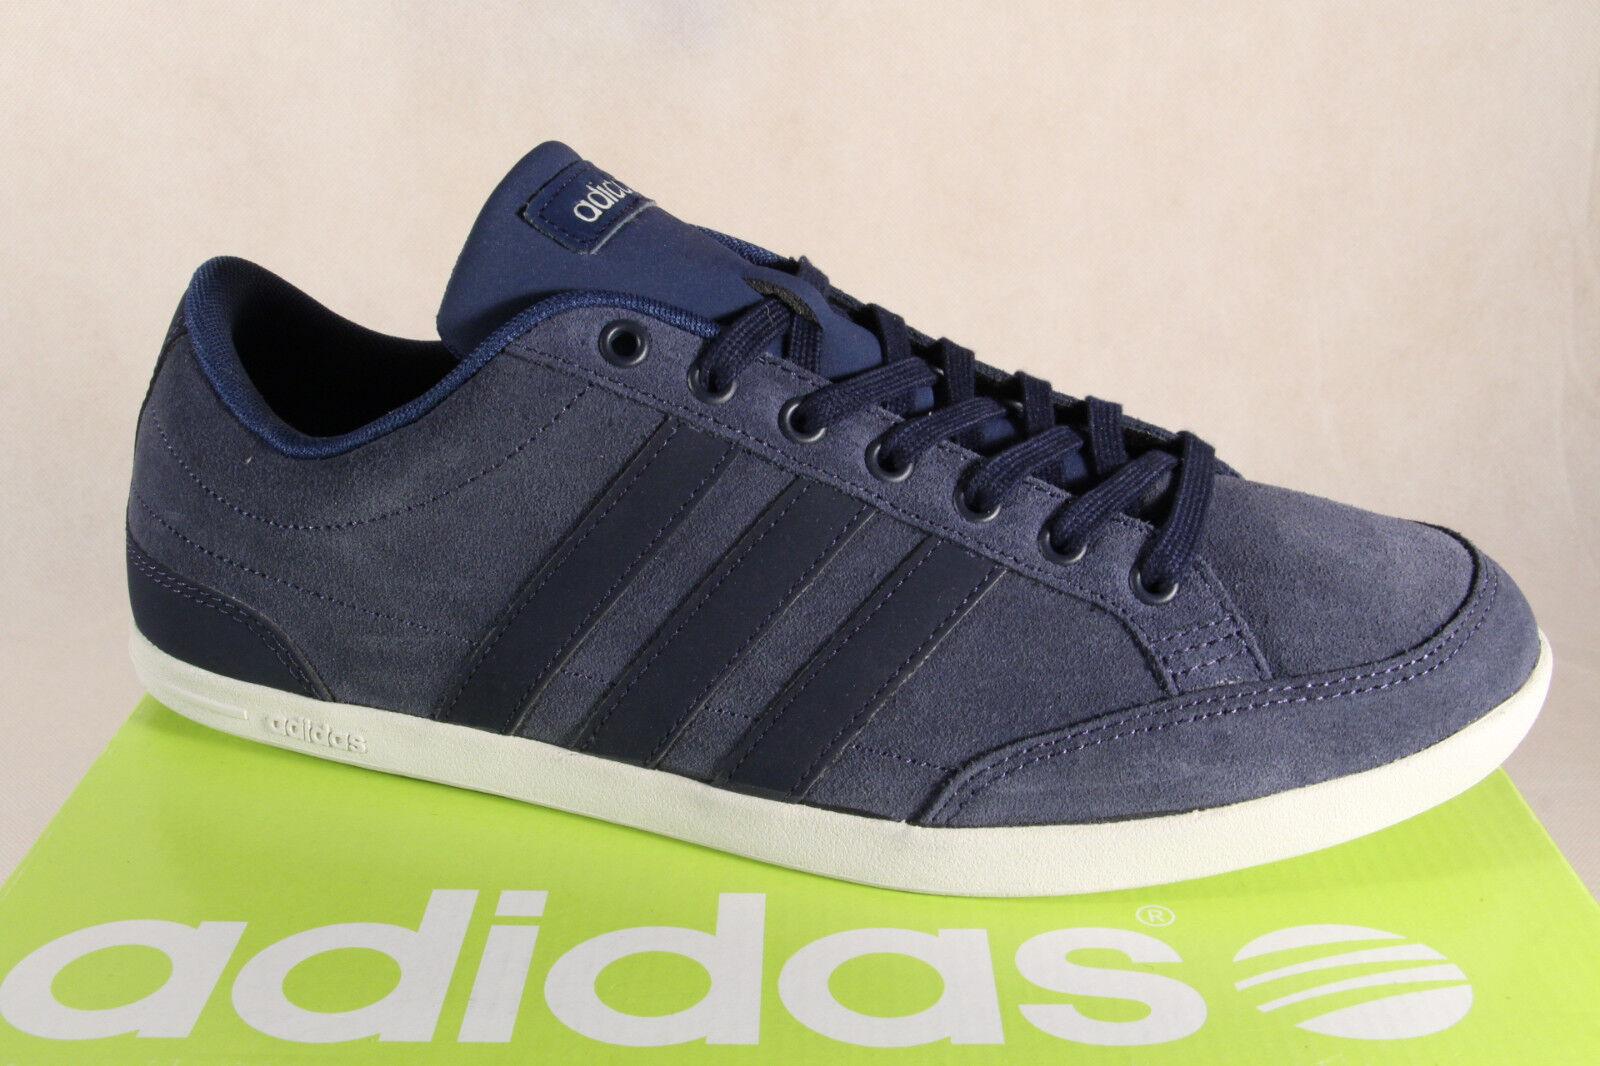 Adidas Schnürschuhe Turnschuhe Halbschuhe Sportschuhe CAFLAIRE Leder blau NEU